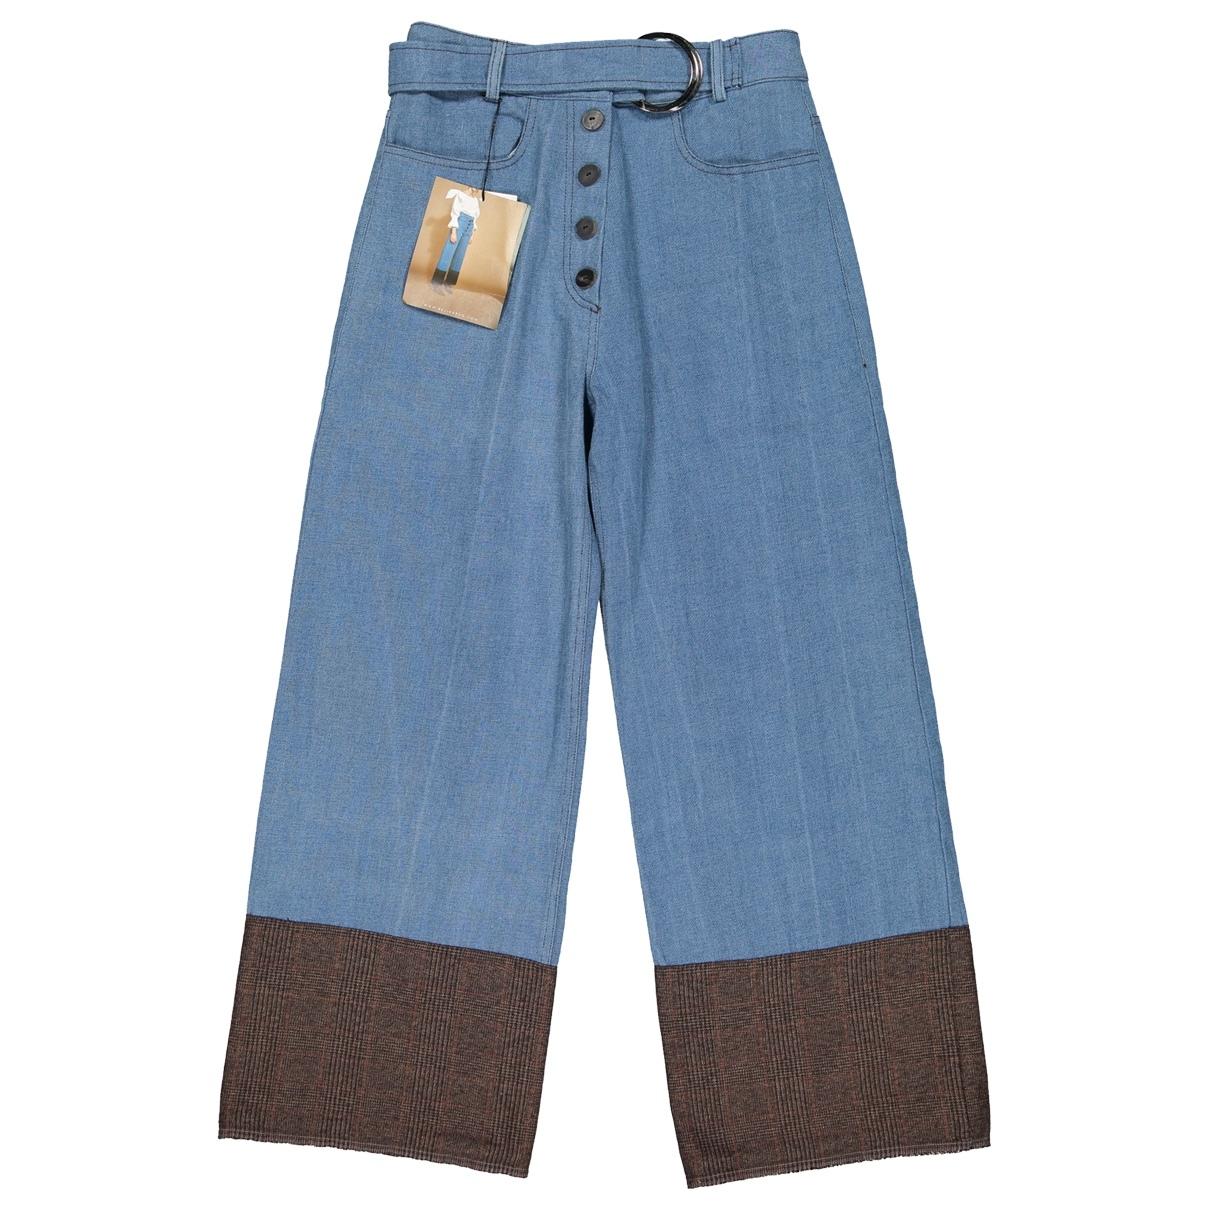 Rejina Pyo X Vestiaire Collective \N Blue Denim - Jeans Jeans for Women 30 US